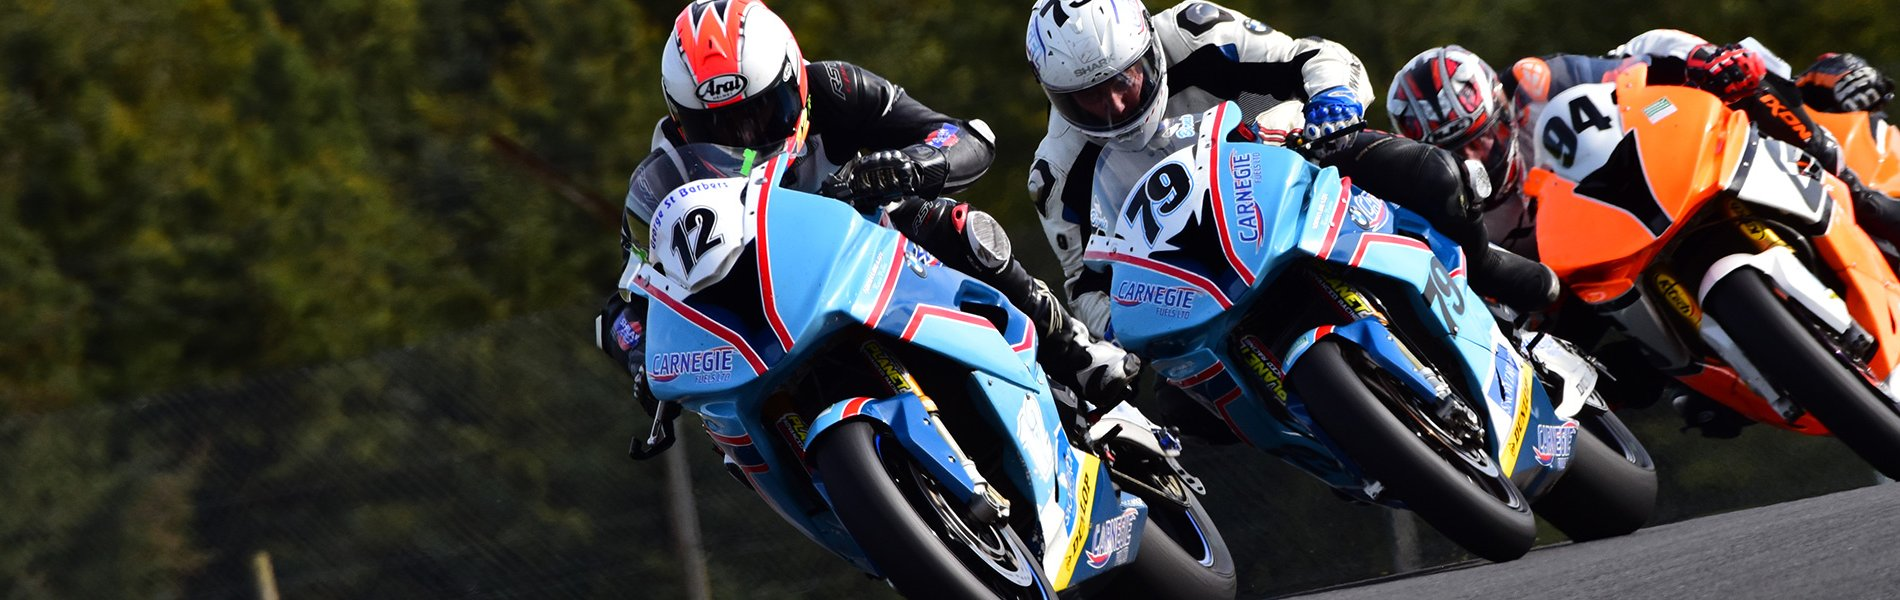 Motor Bike racing at Knockhill